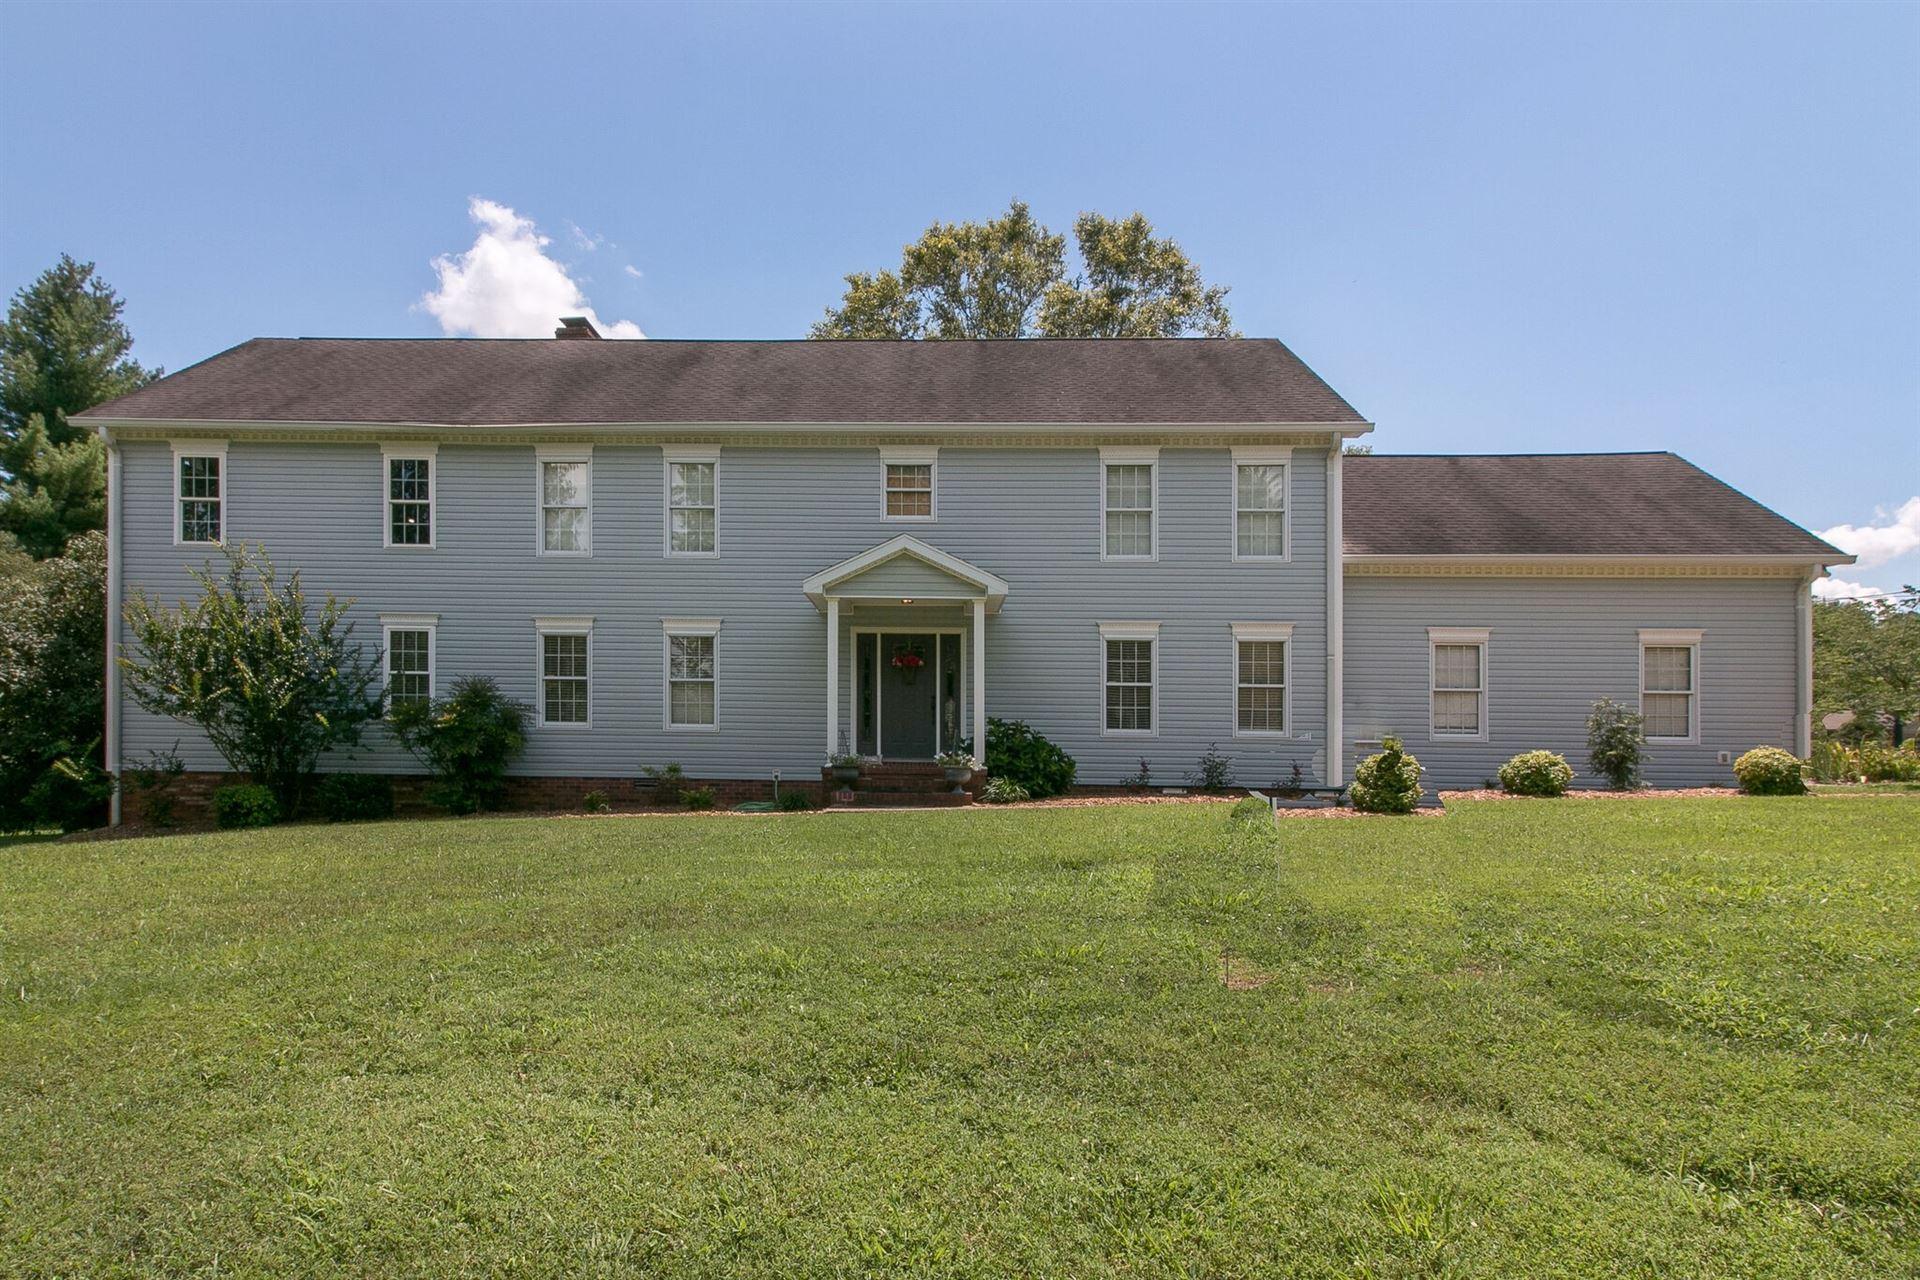 307 Remington Rd, Hopkinsville, KY 42240 - MLS#: 2173615